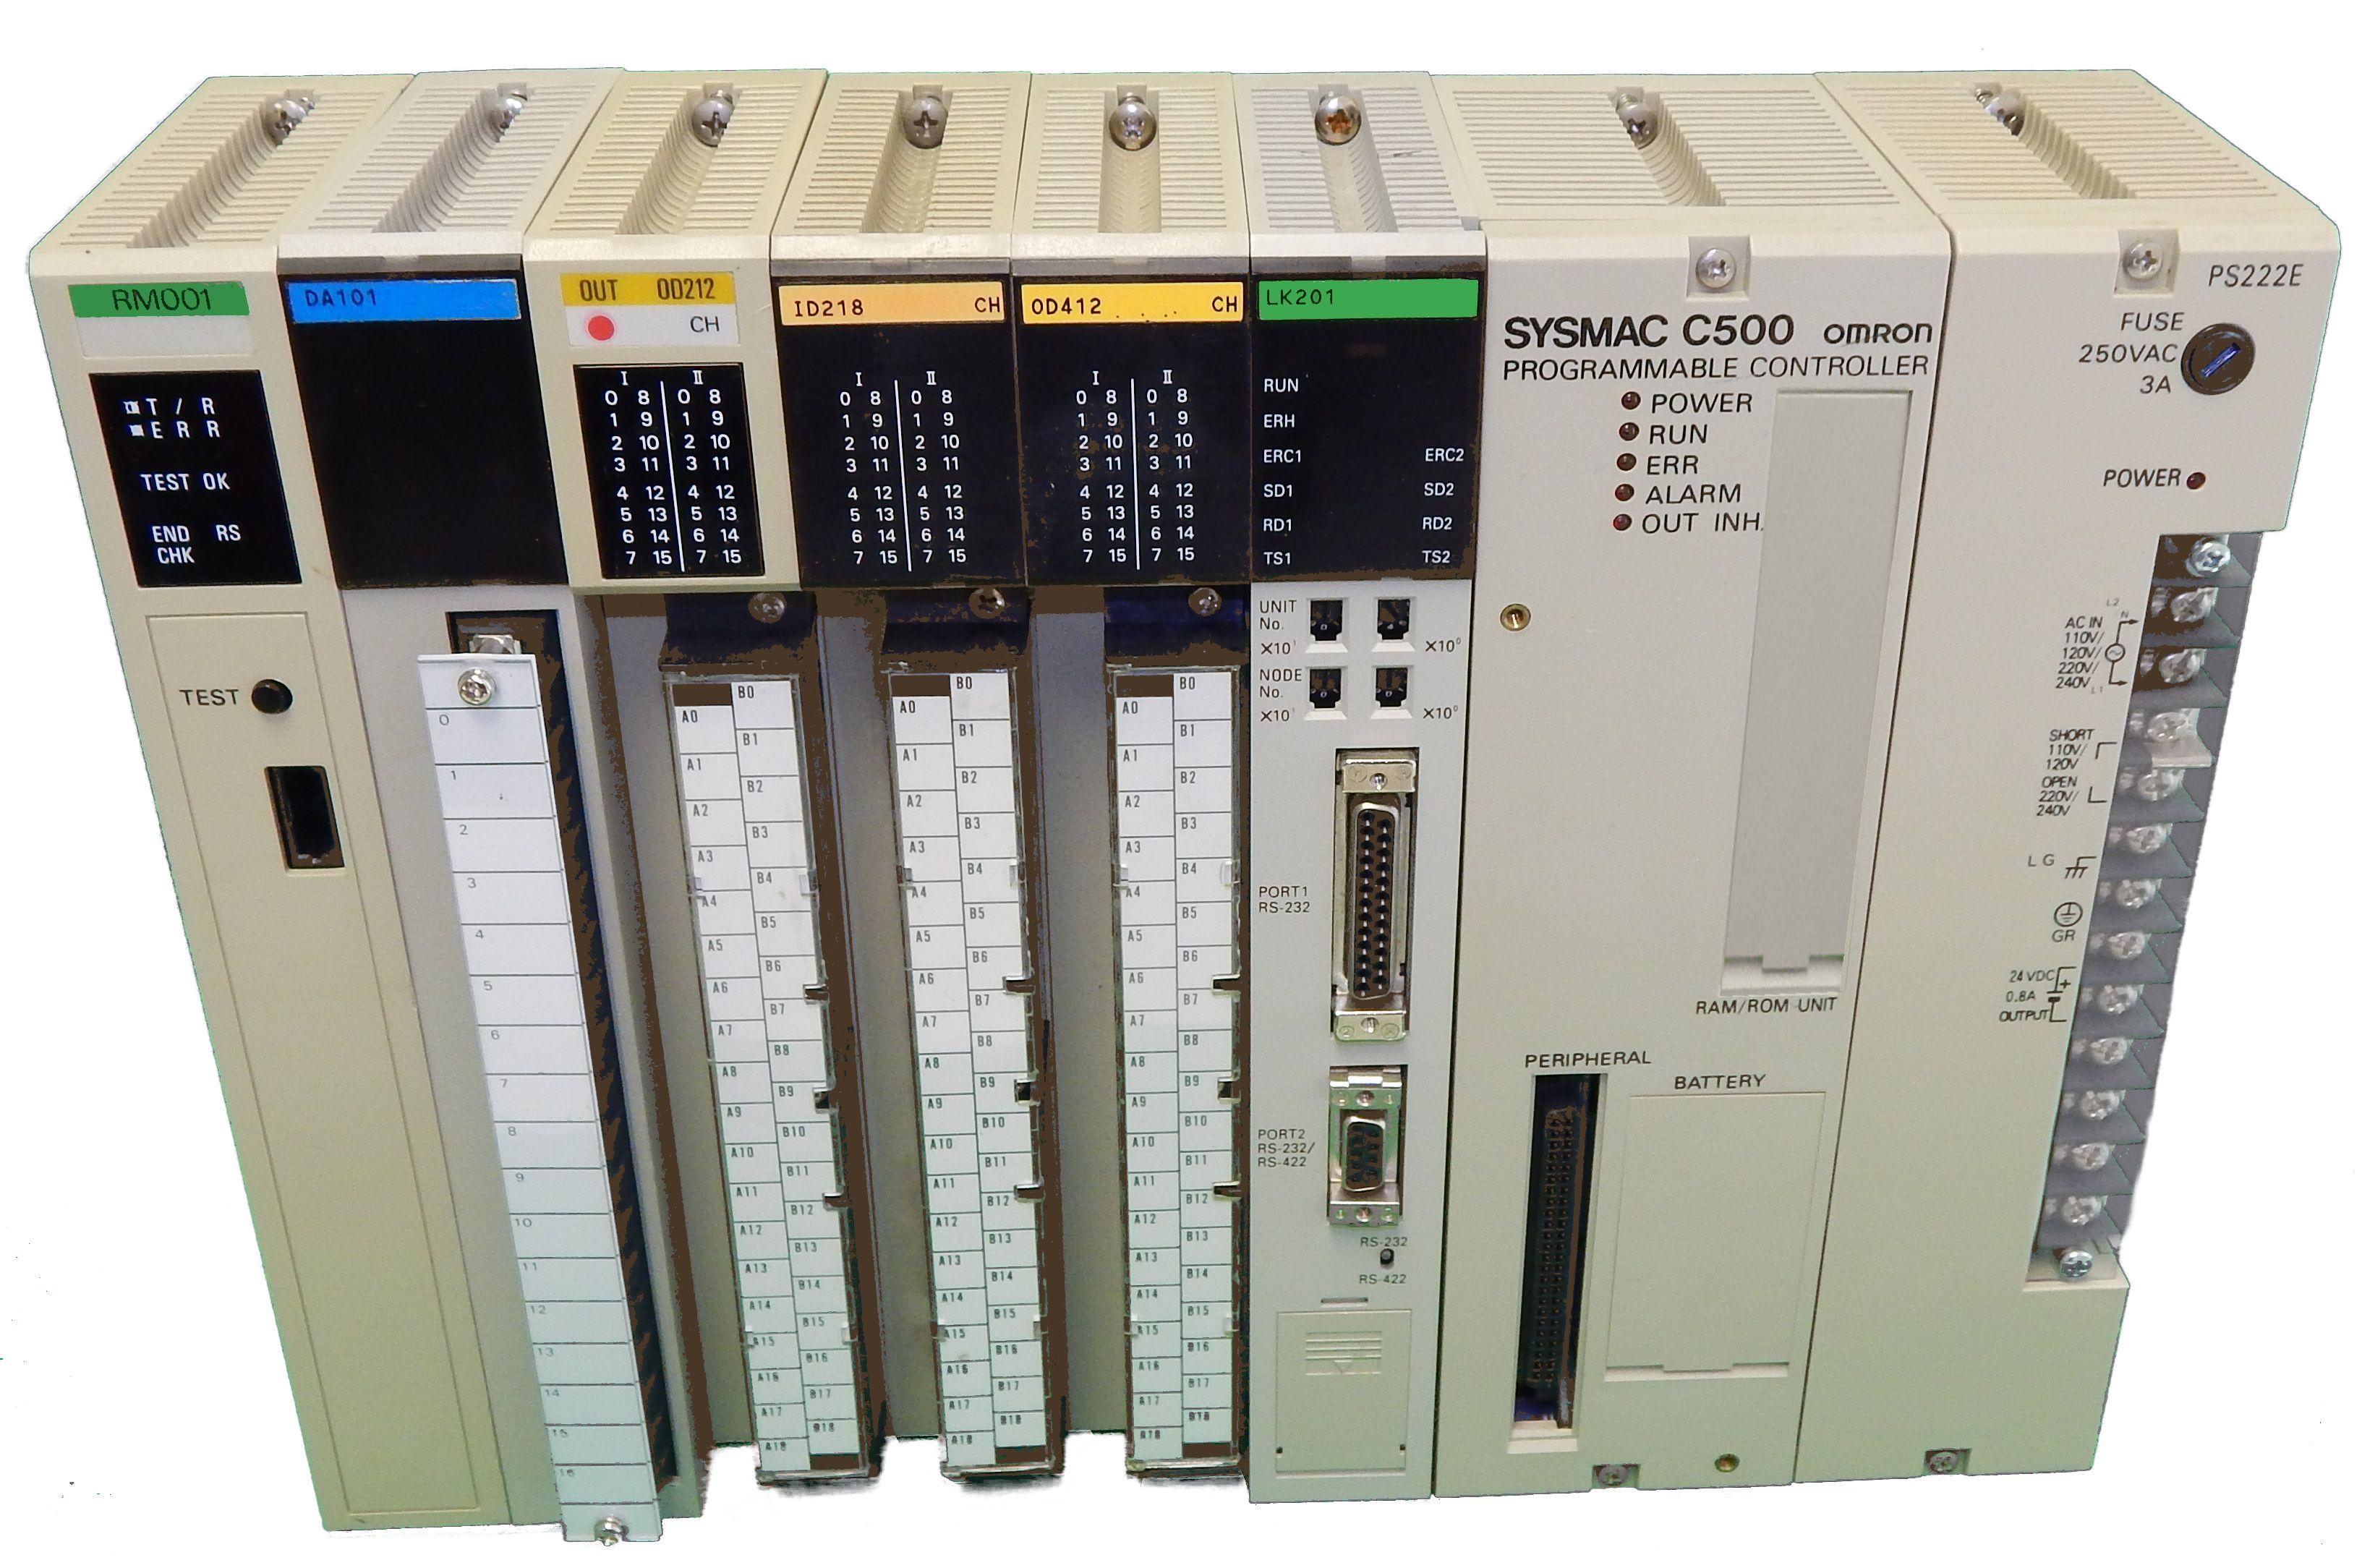 3G2C7-MD212